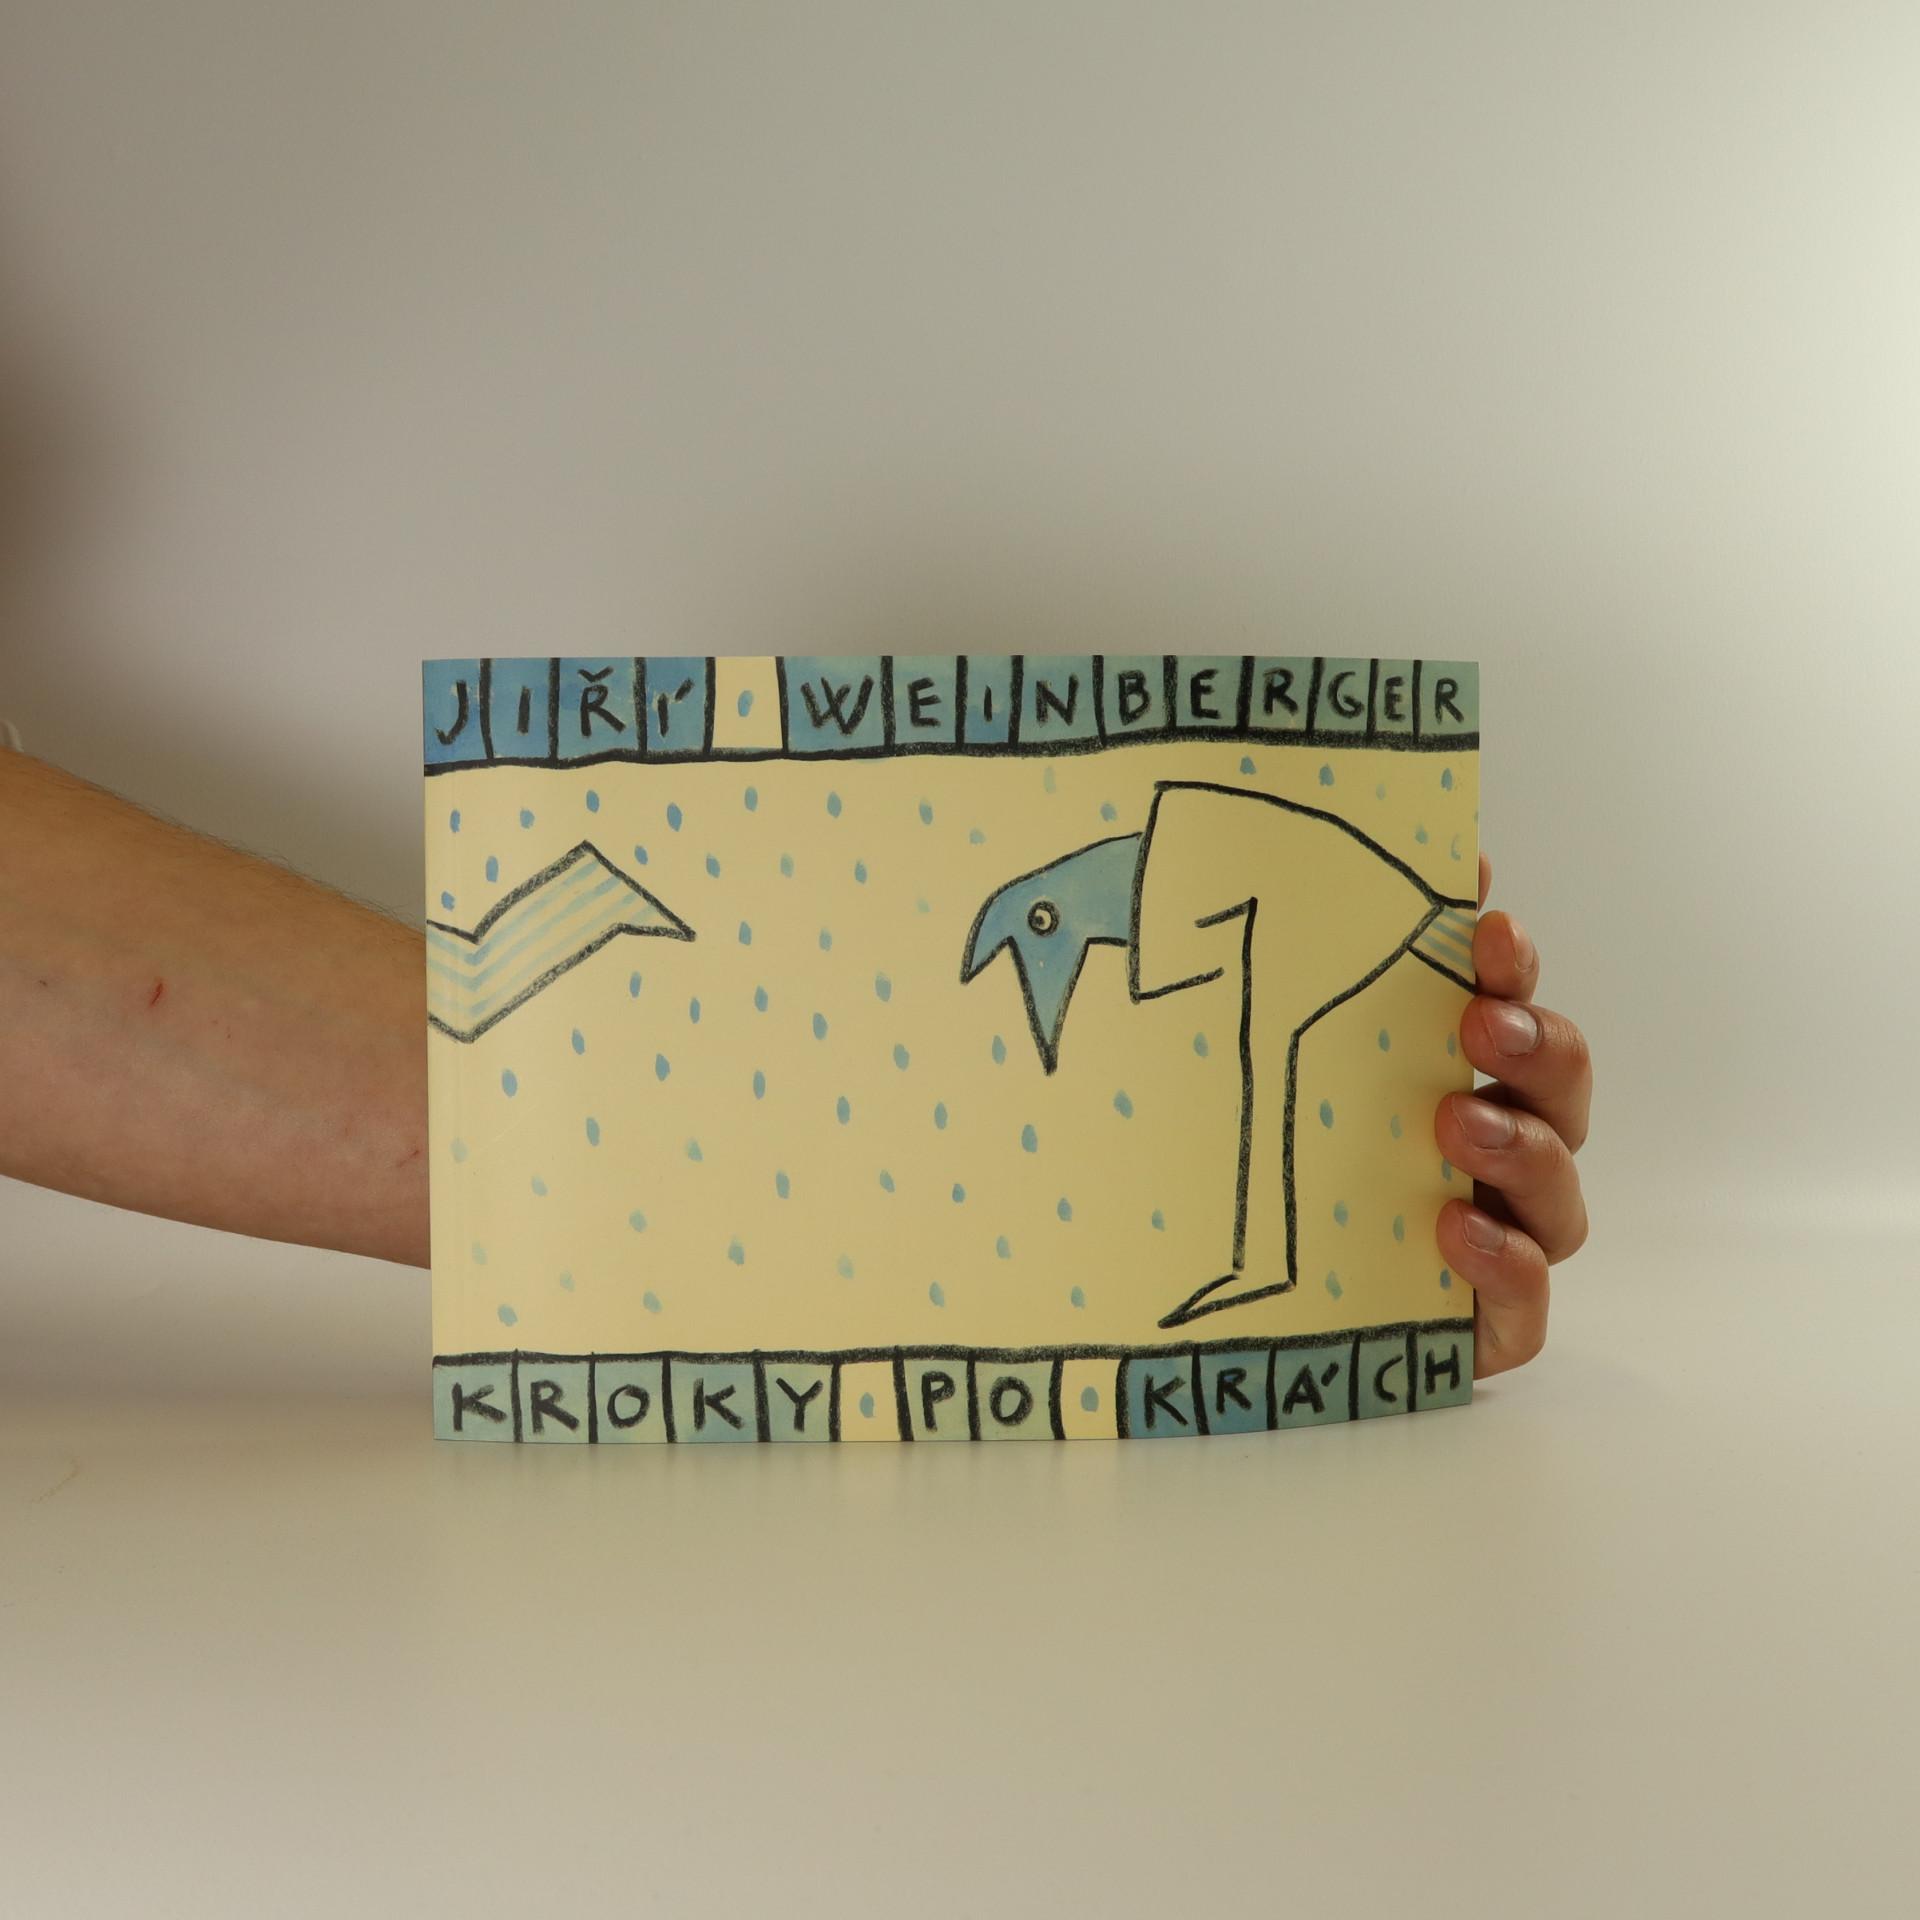 antikvární kniha Kroky po krách (viz foto a stav), 2006